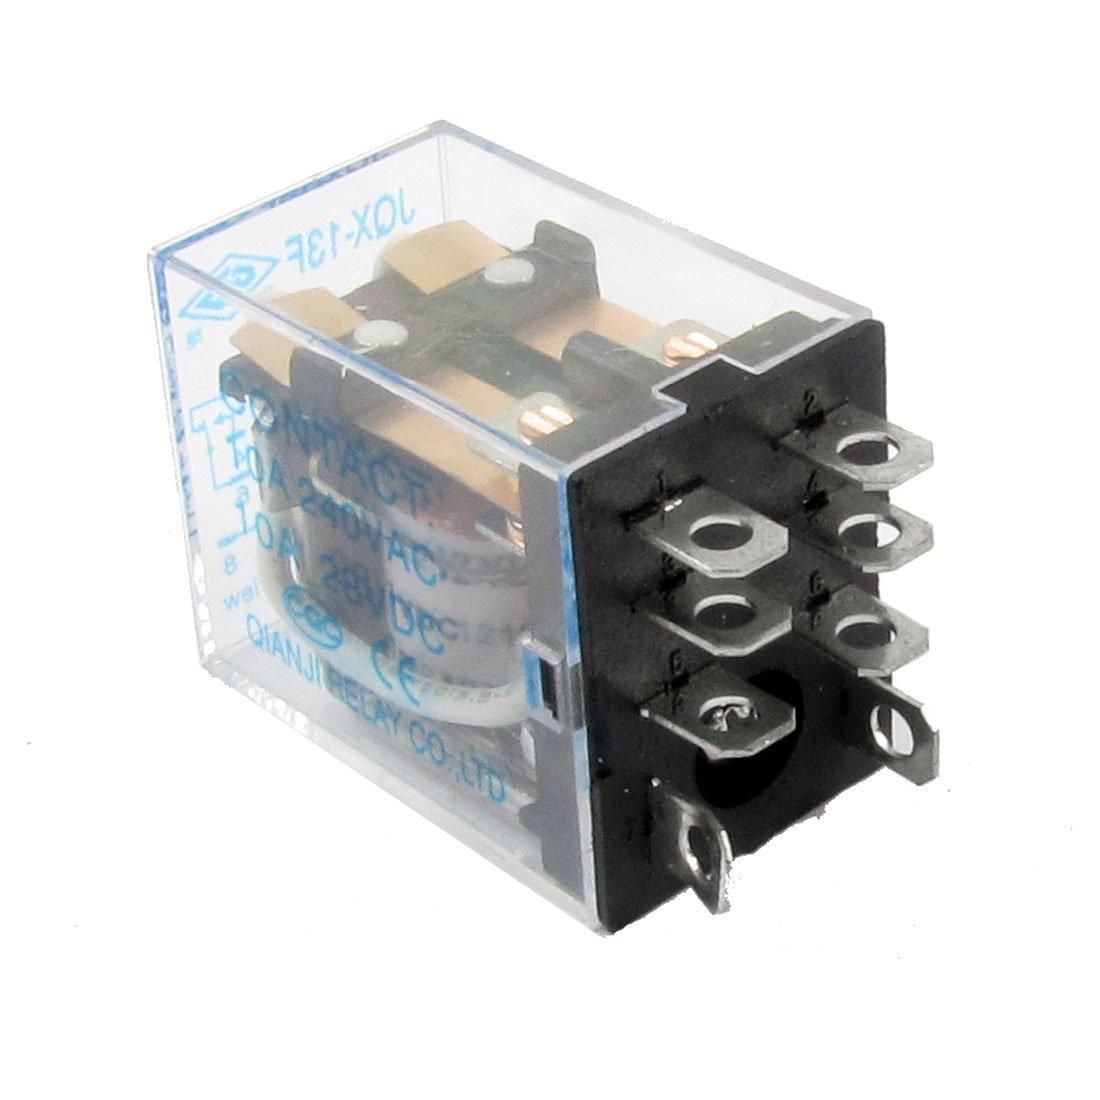 uxcell 8 Pin Terminals AC240V DC28V 10A Contact DC12V Coil Power Relay JQX-13F2Z